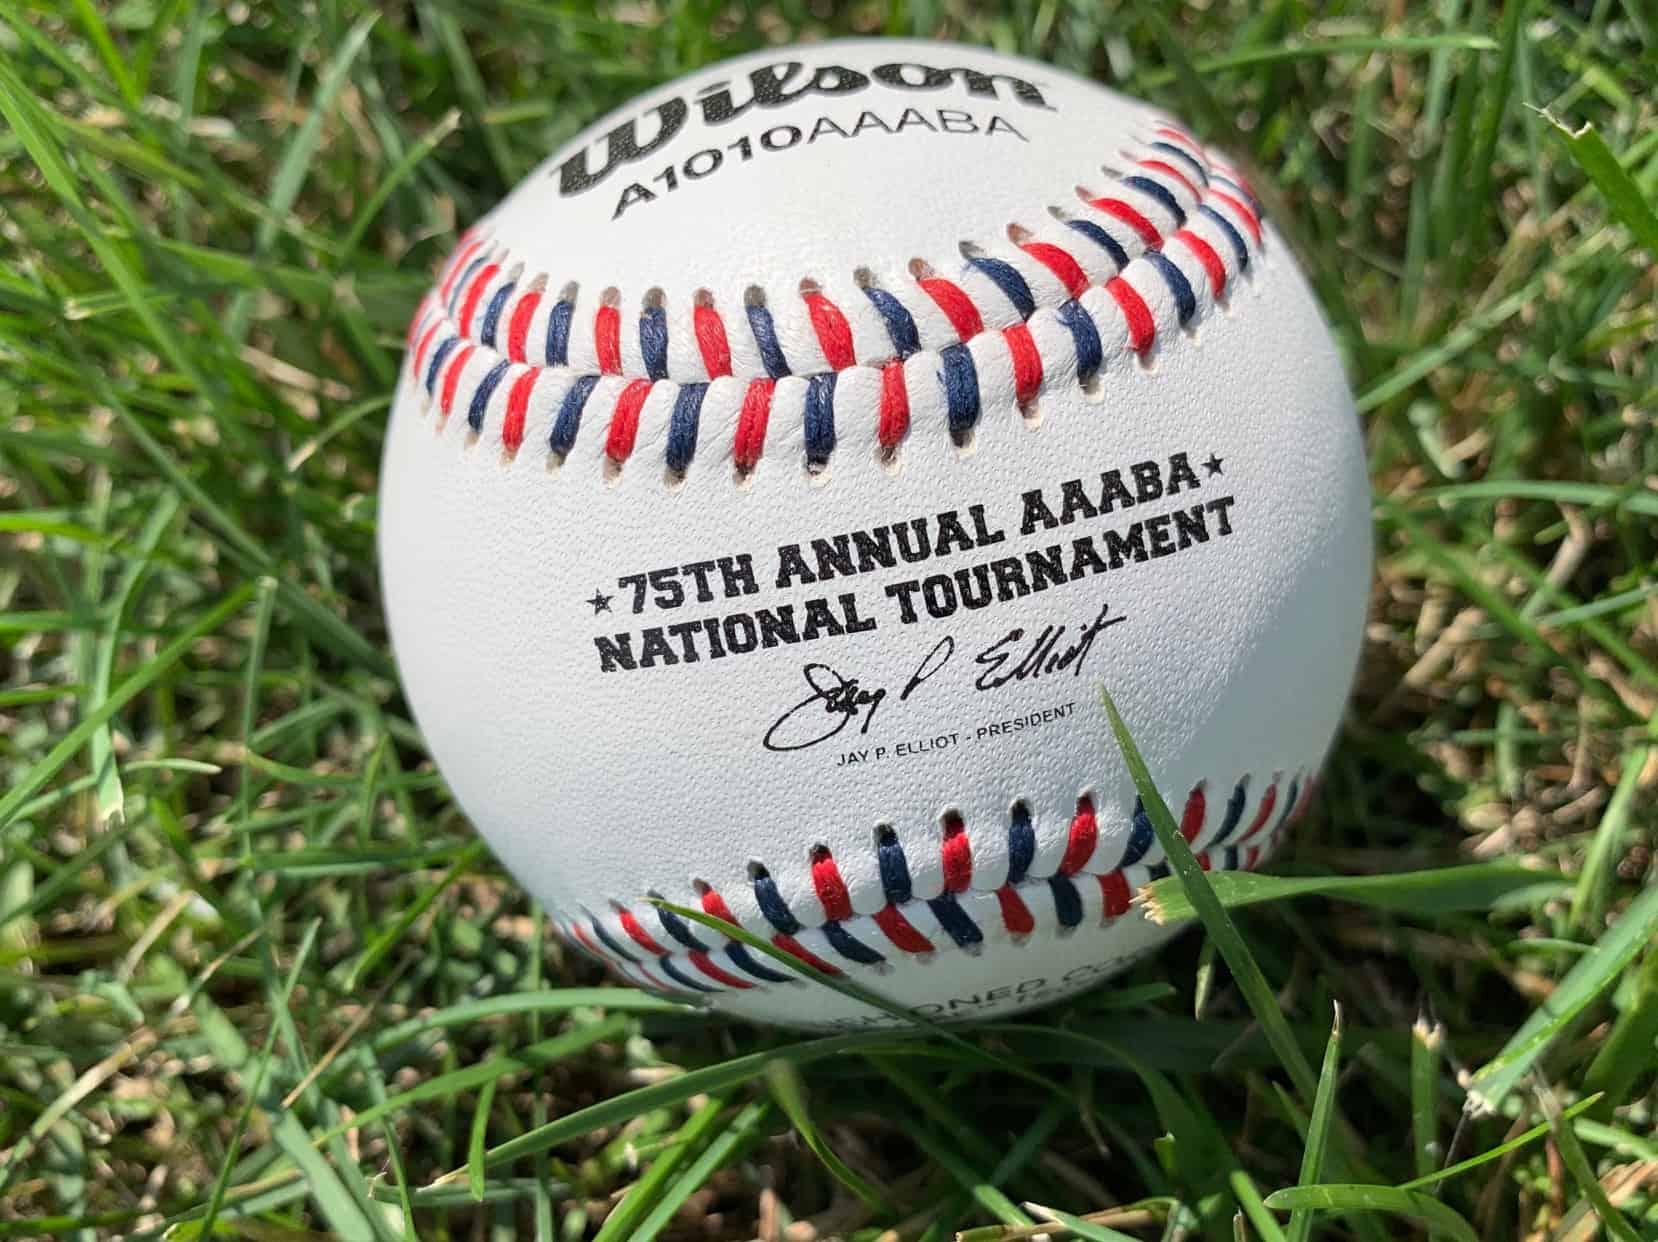 AAABA 75th anniversary ball tight shot